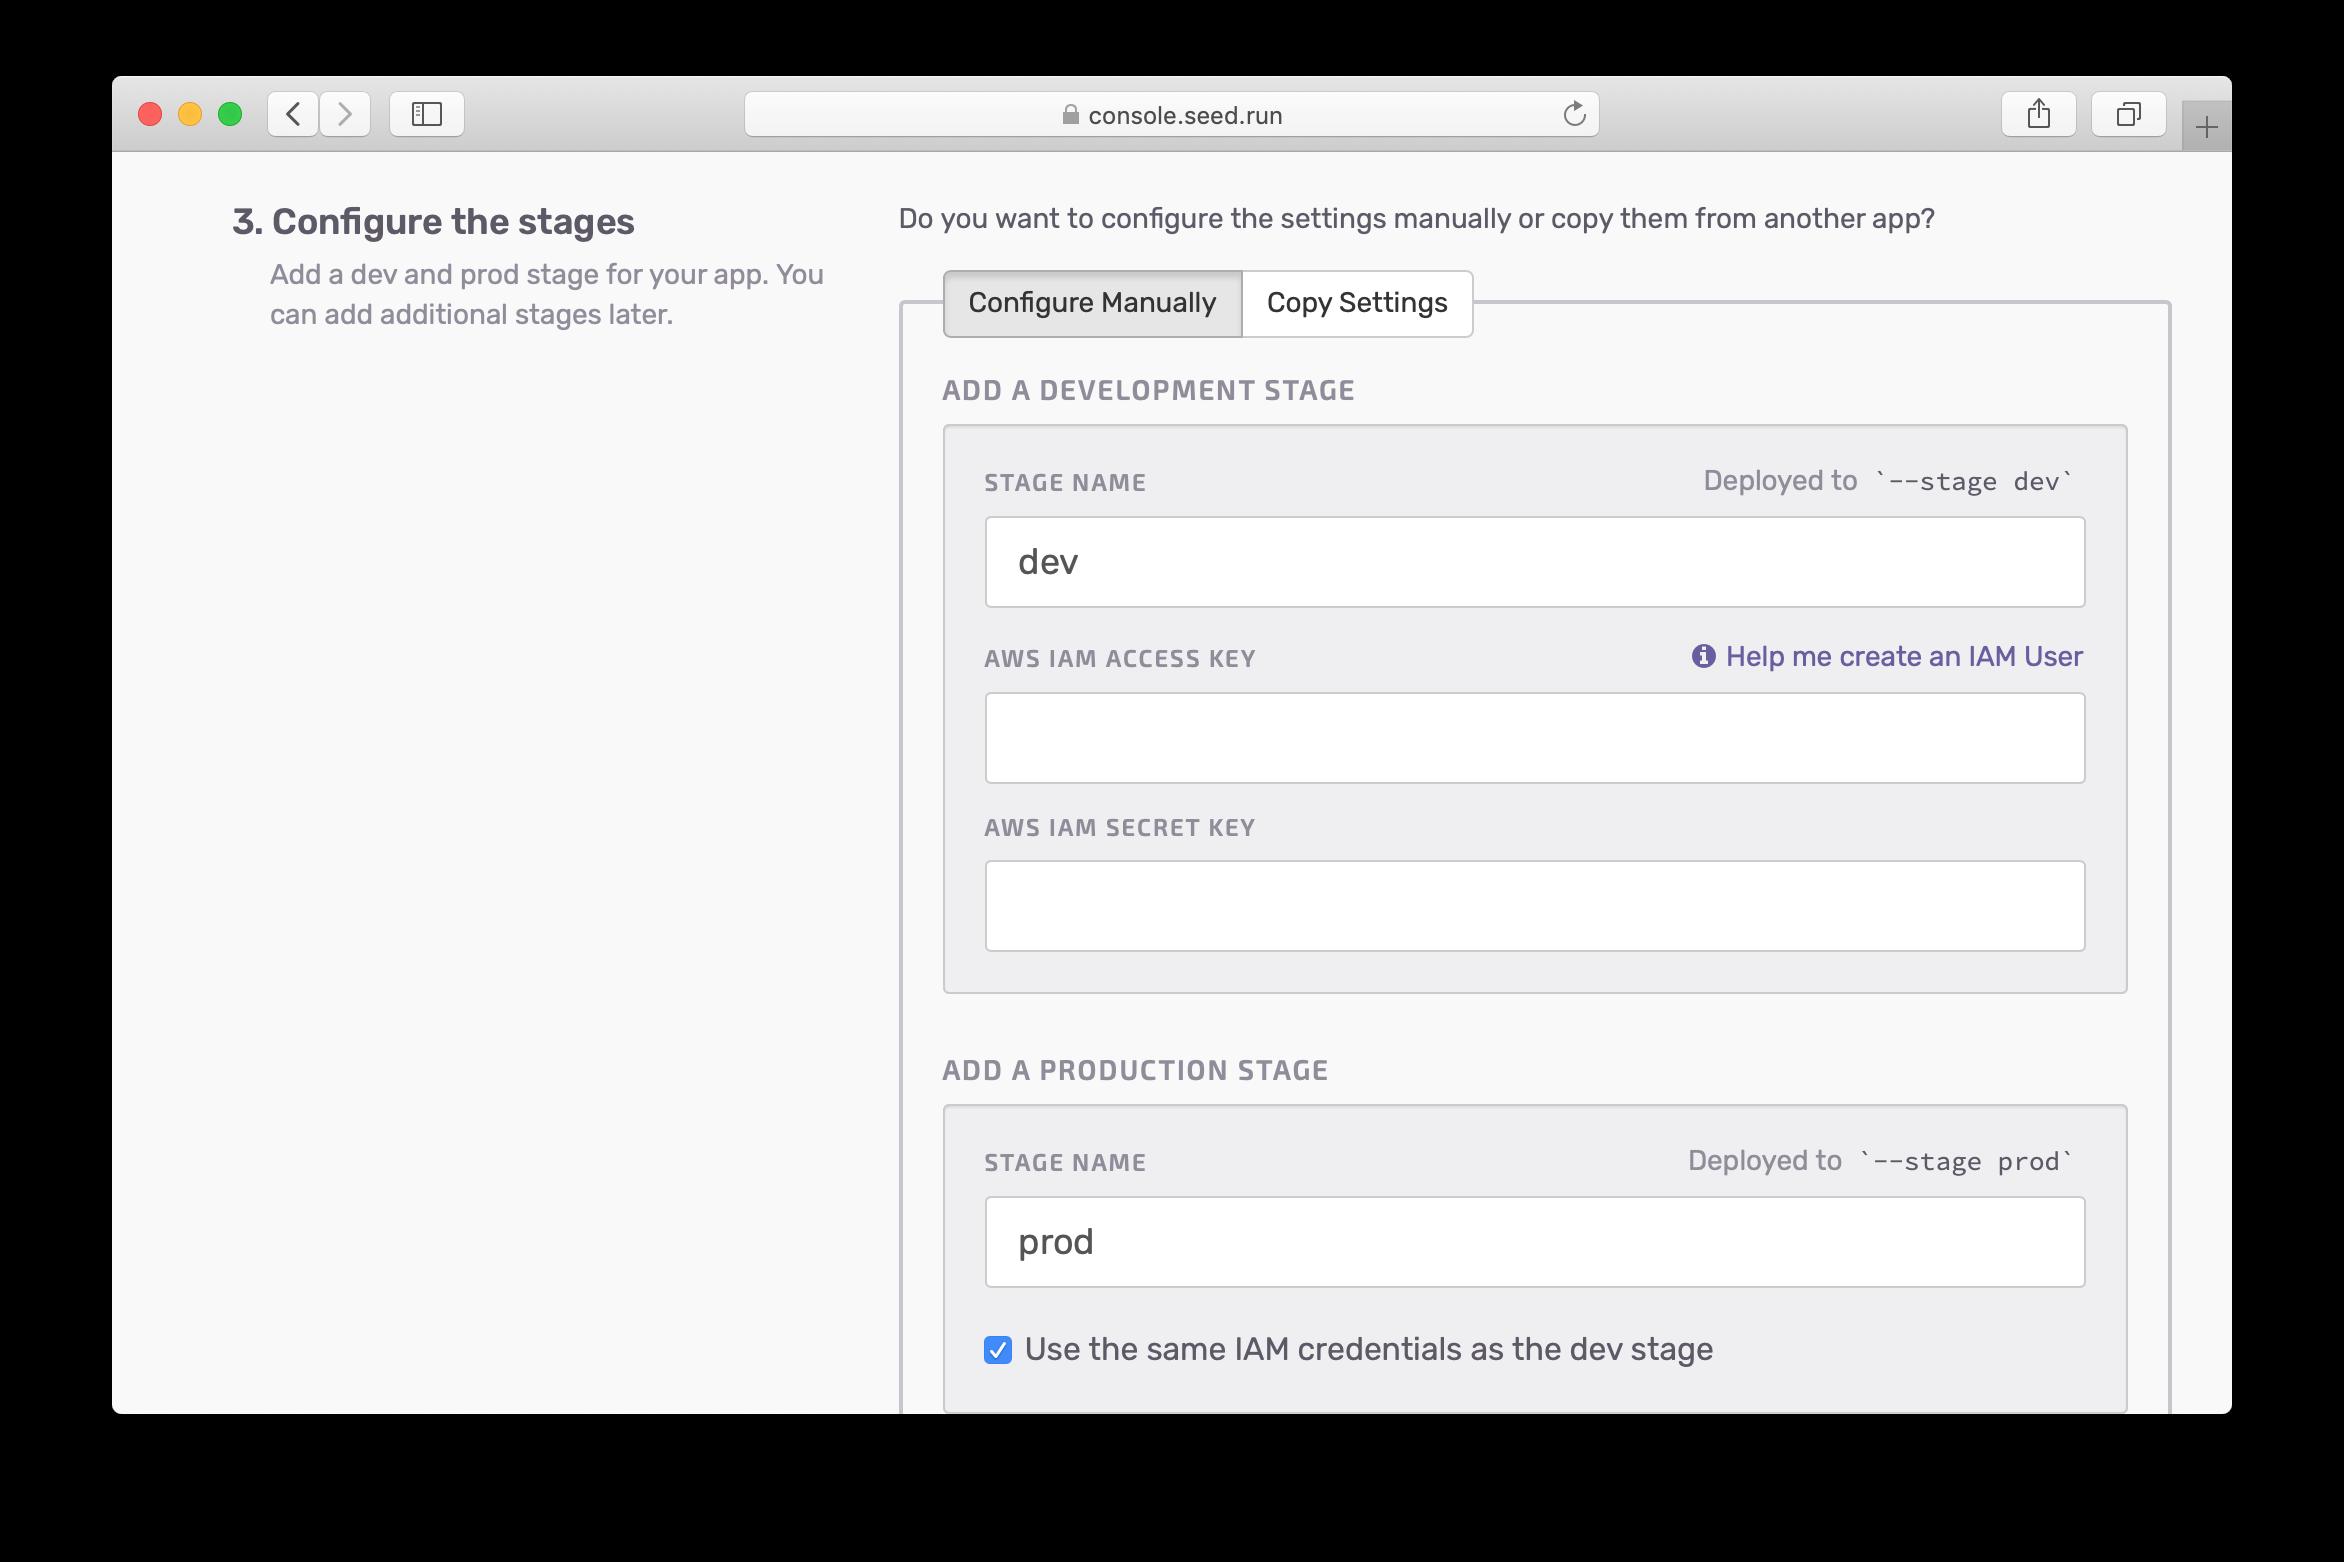 Click the help me create an IAM user link screenshot